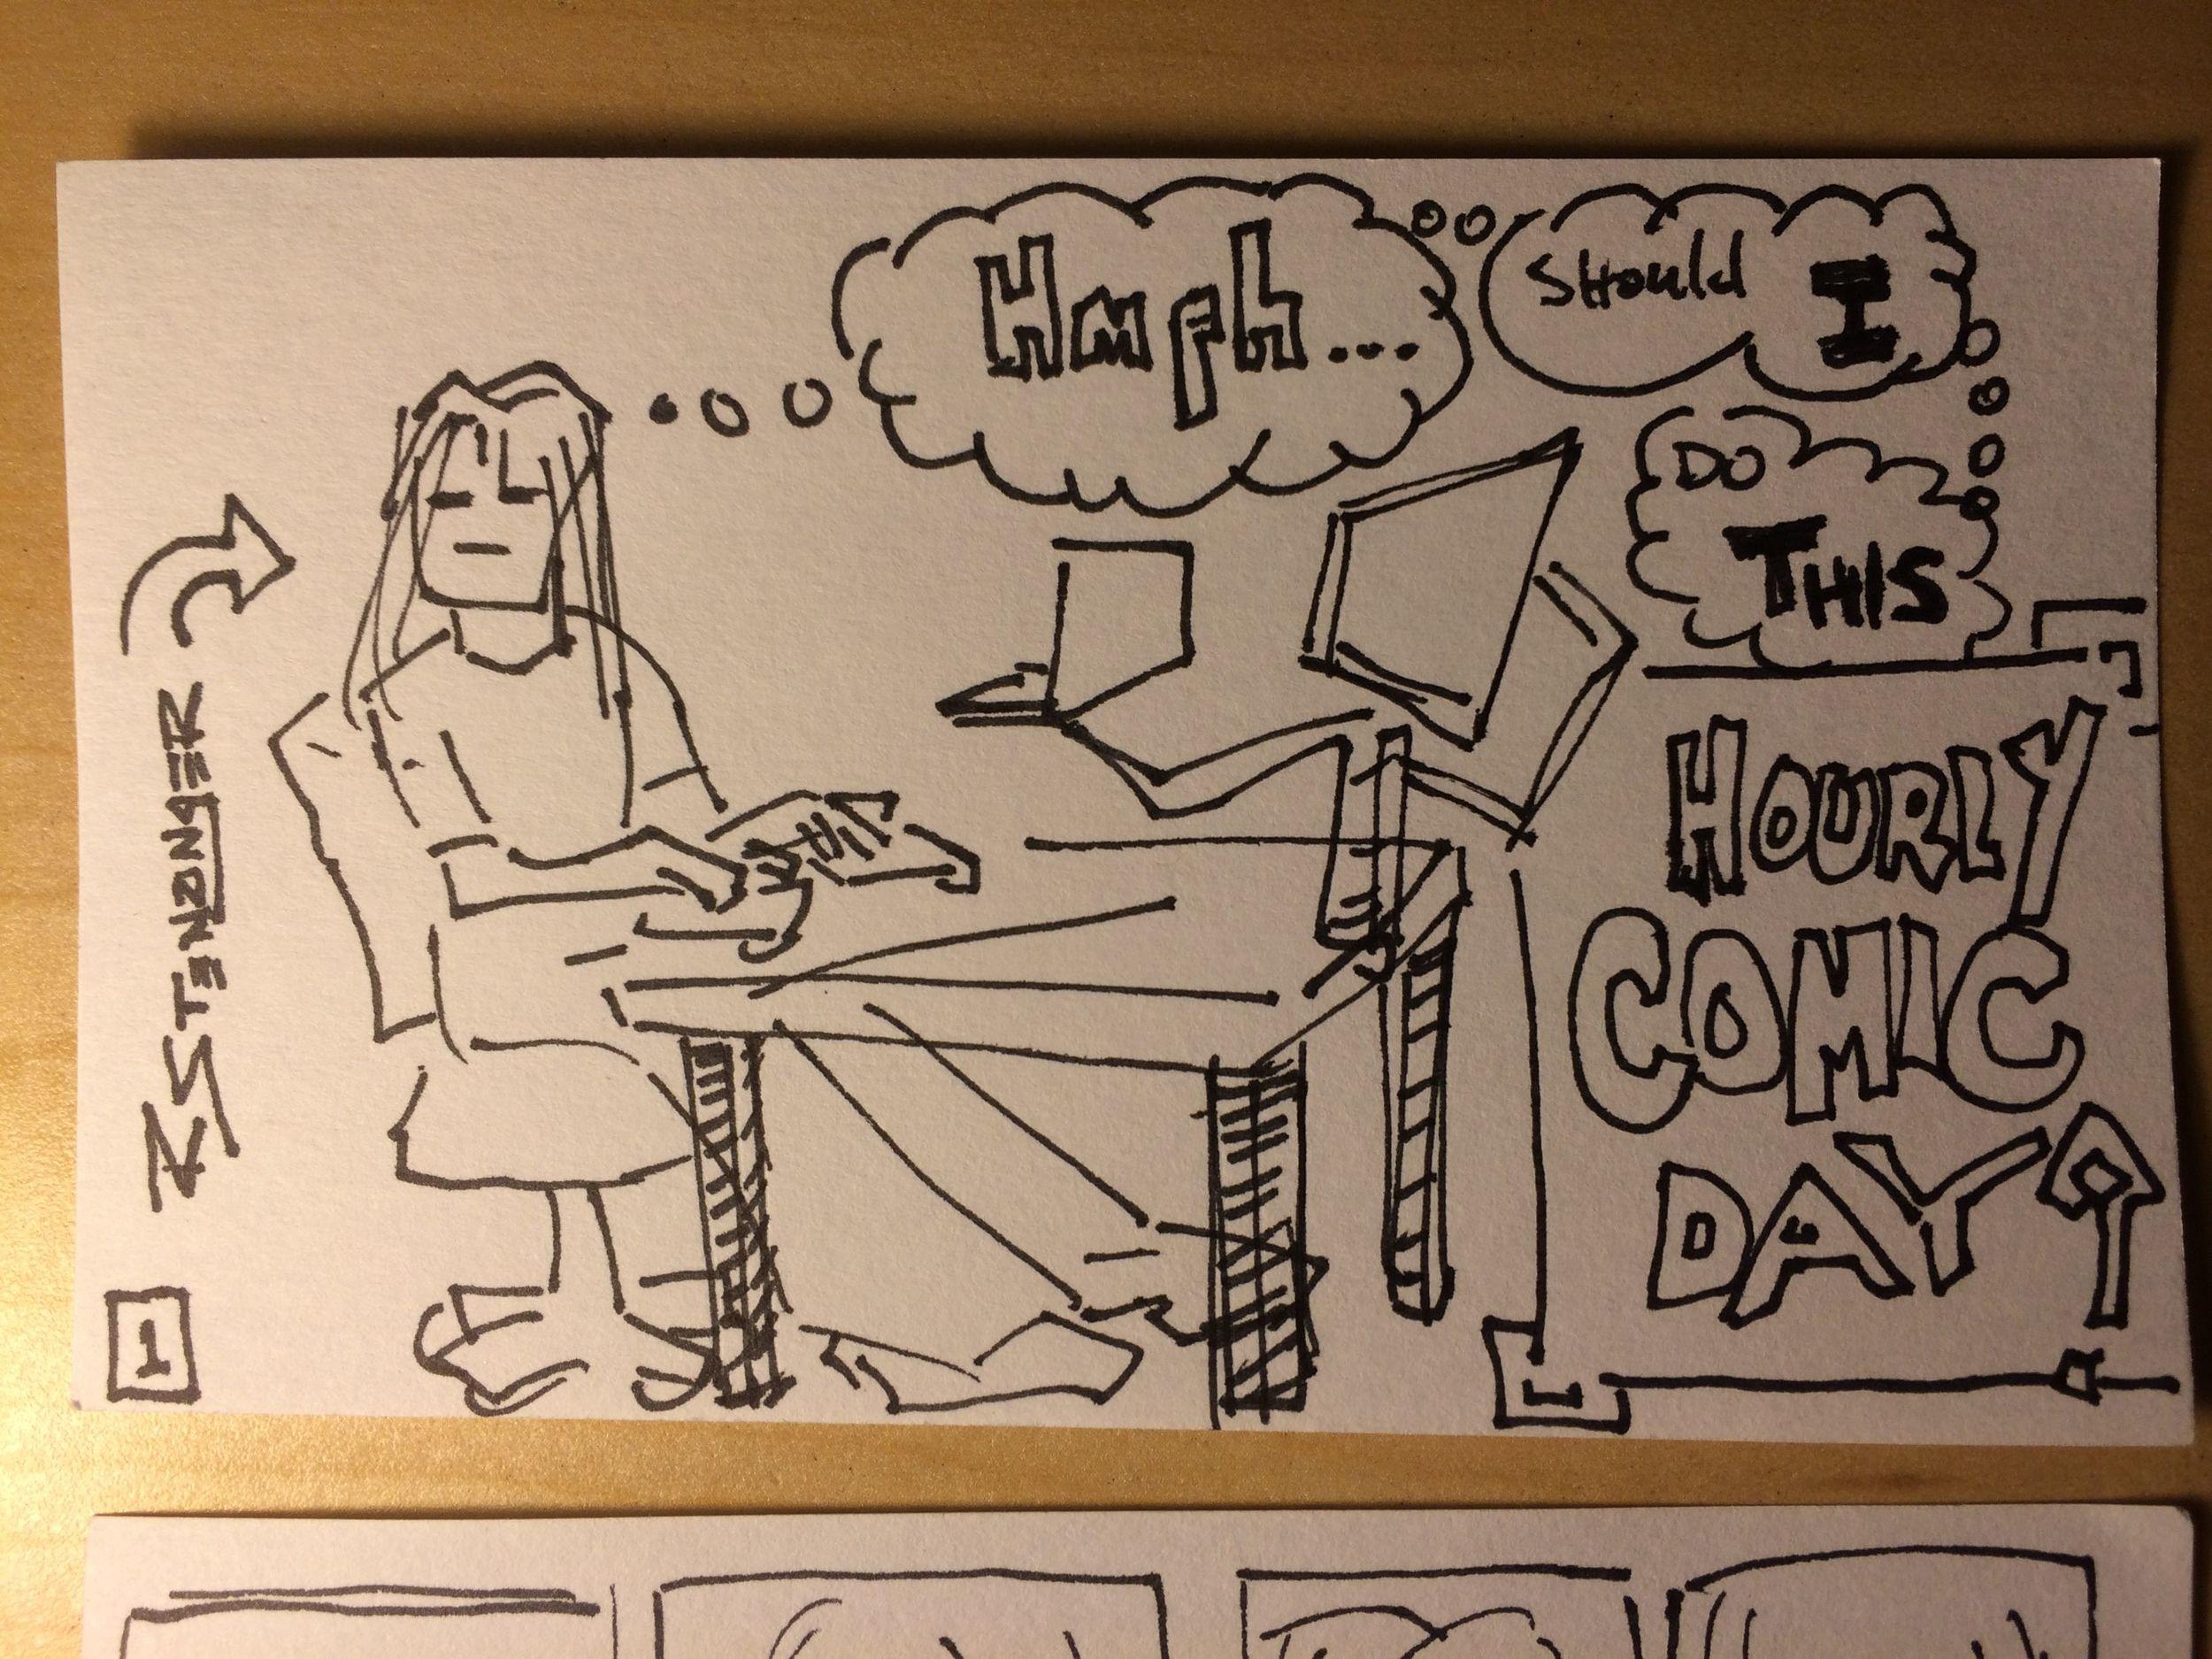 hourly-comic-day2.jpg